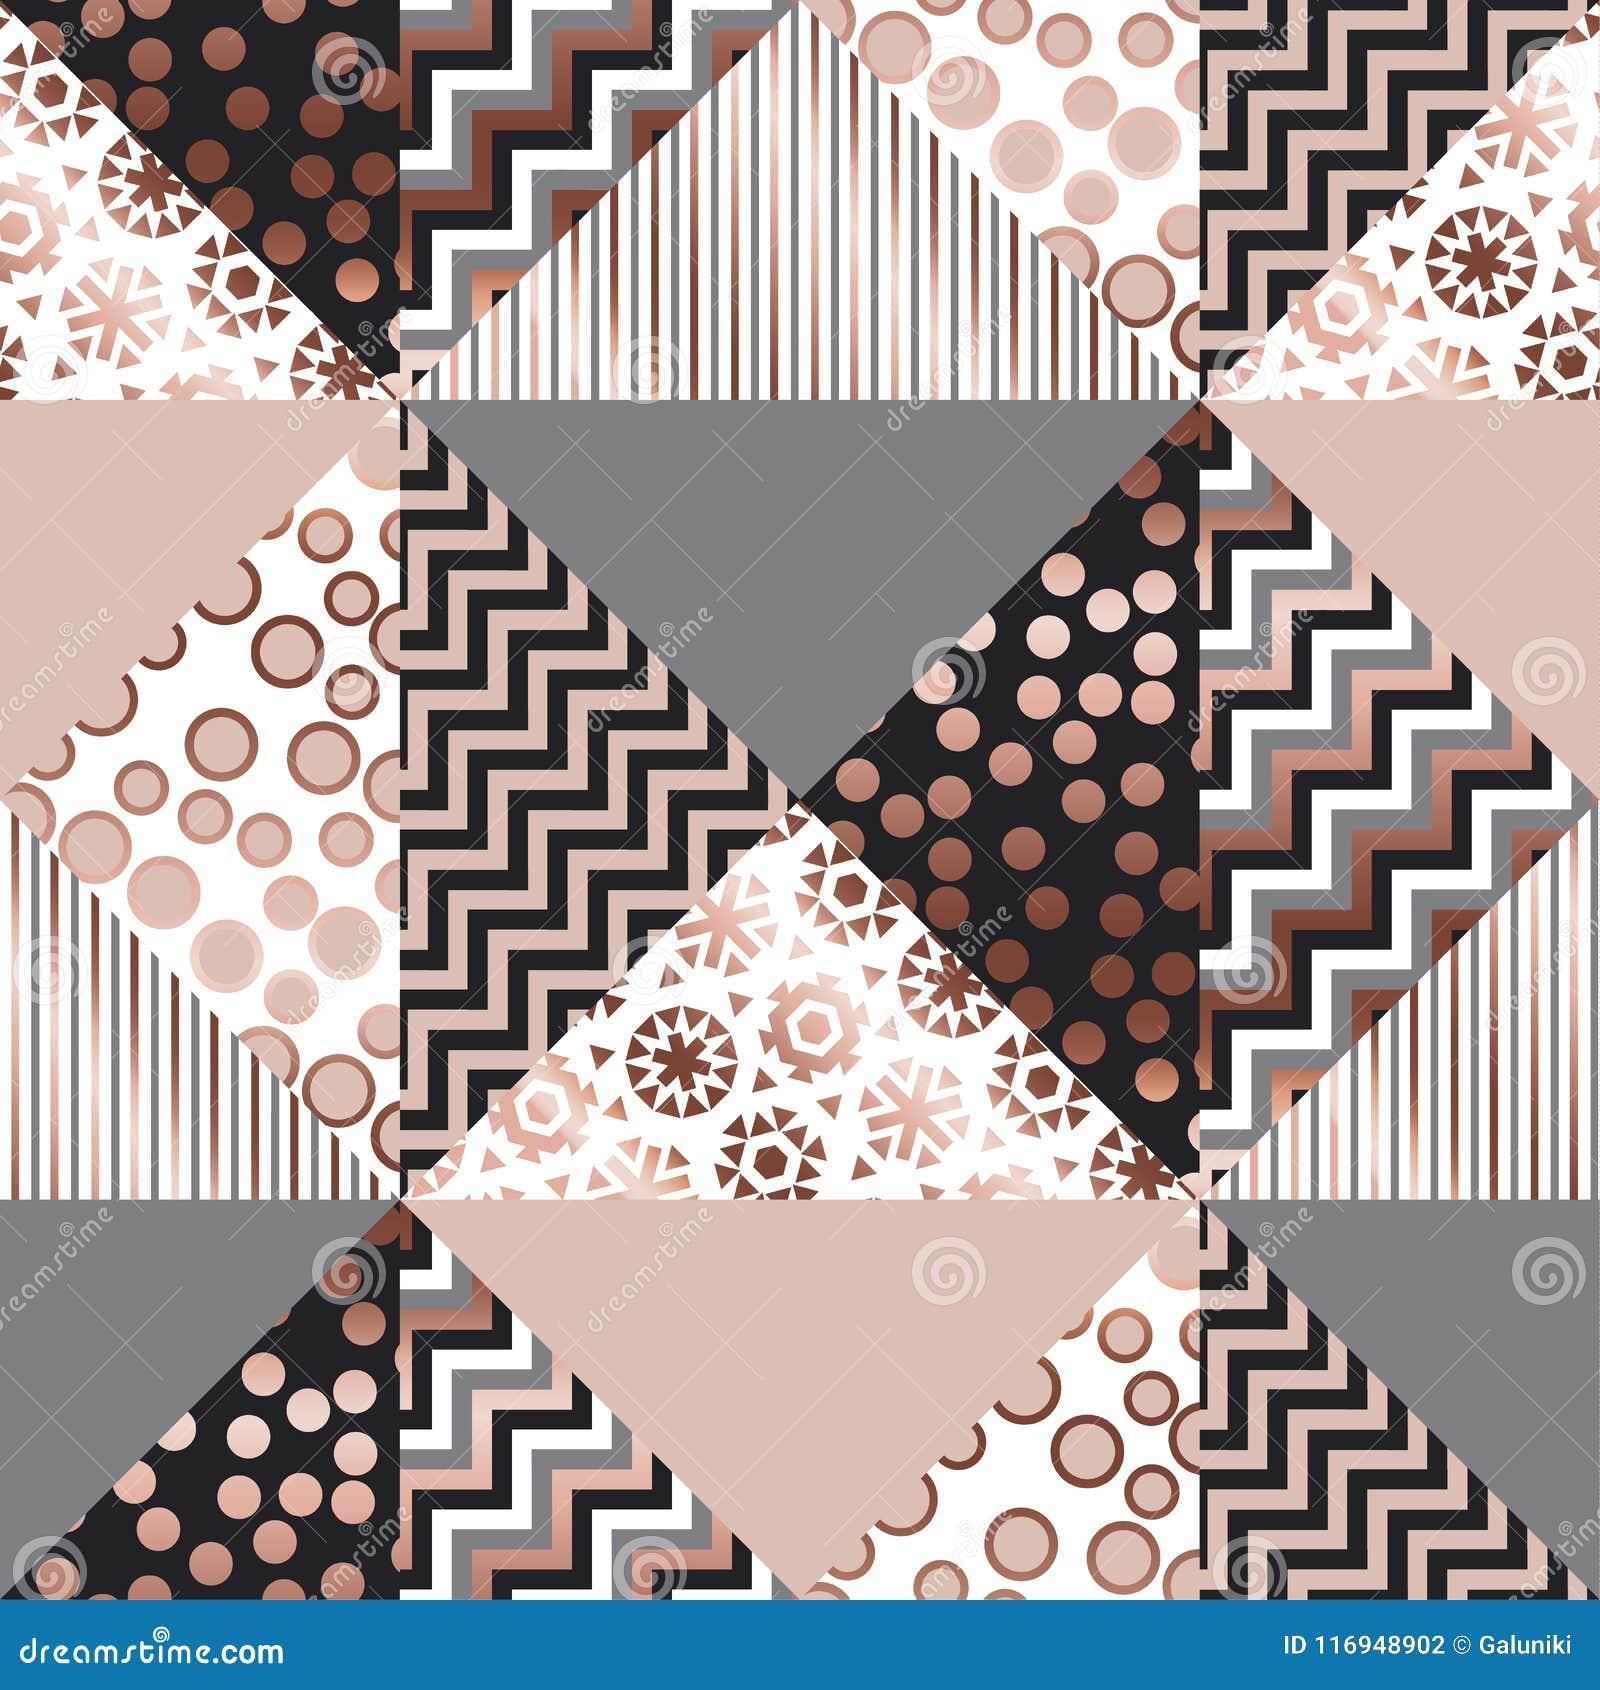 Luxury Rose Gold Xmas Geometric Seamless Pattern Stock Vector Illustration Of Luxury Black 116948902